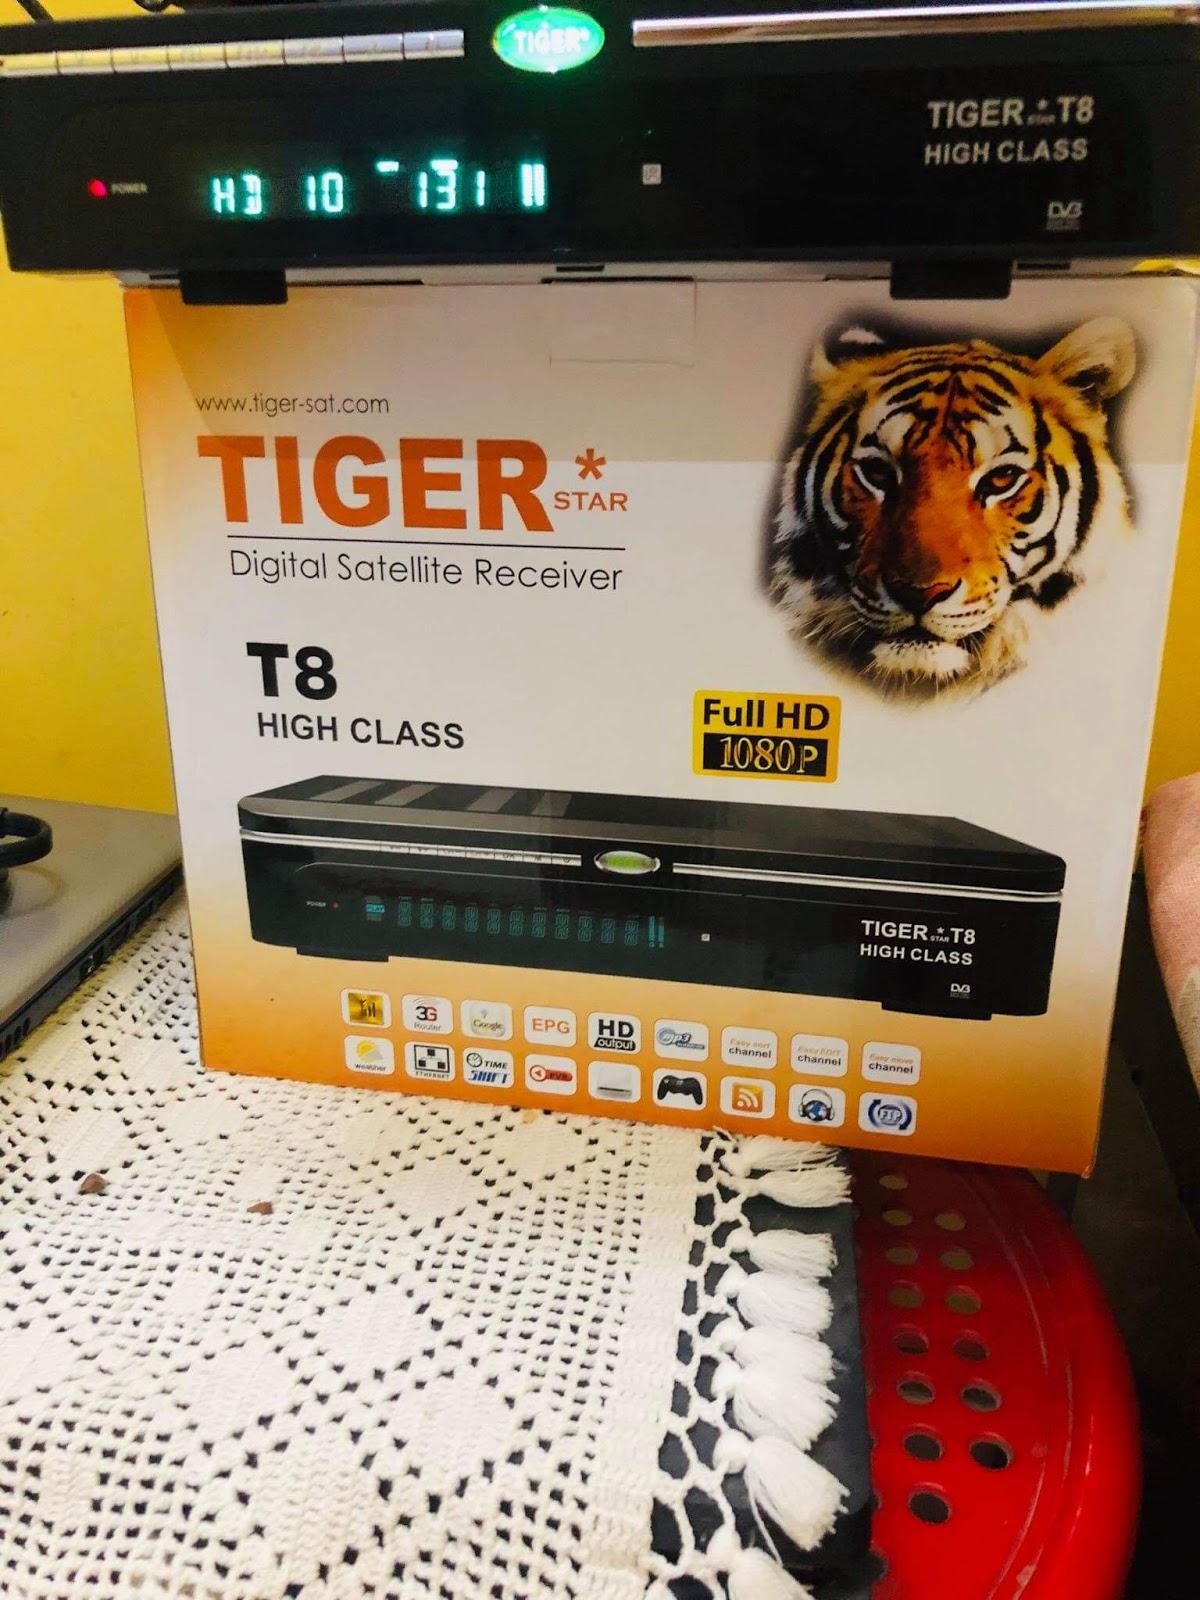 TIGER T8 HIGH CLASS HD RECEIVER, AUTO ROLL POWERVU KEY NEW ALL